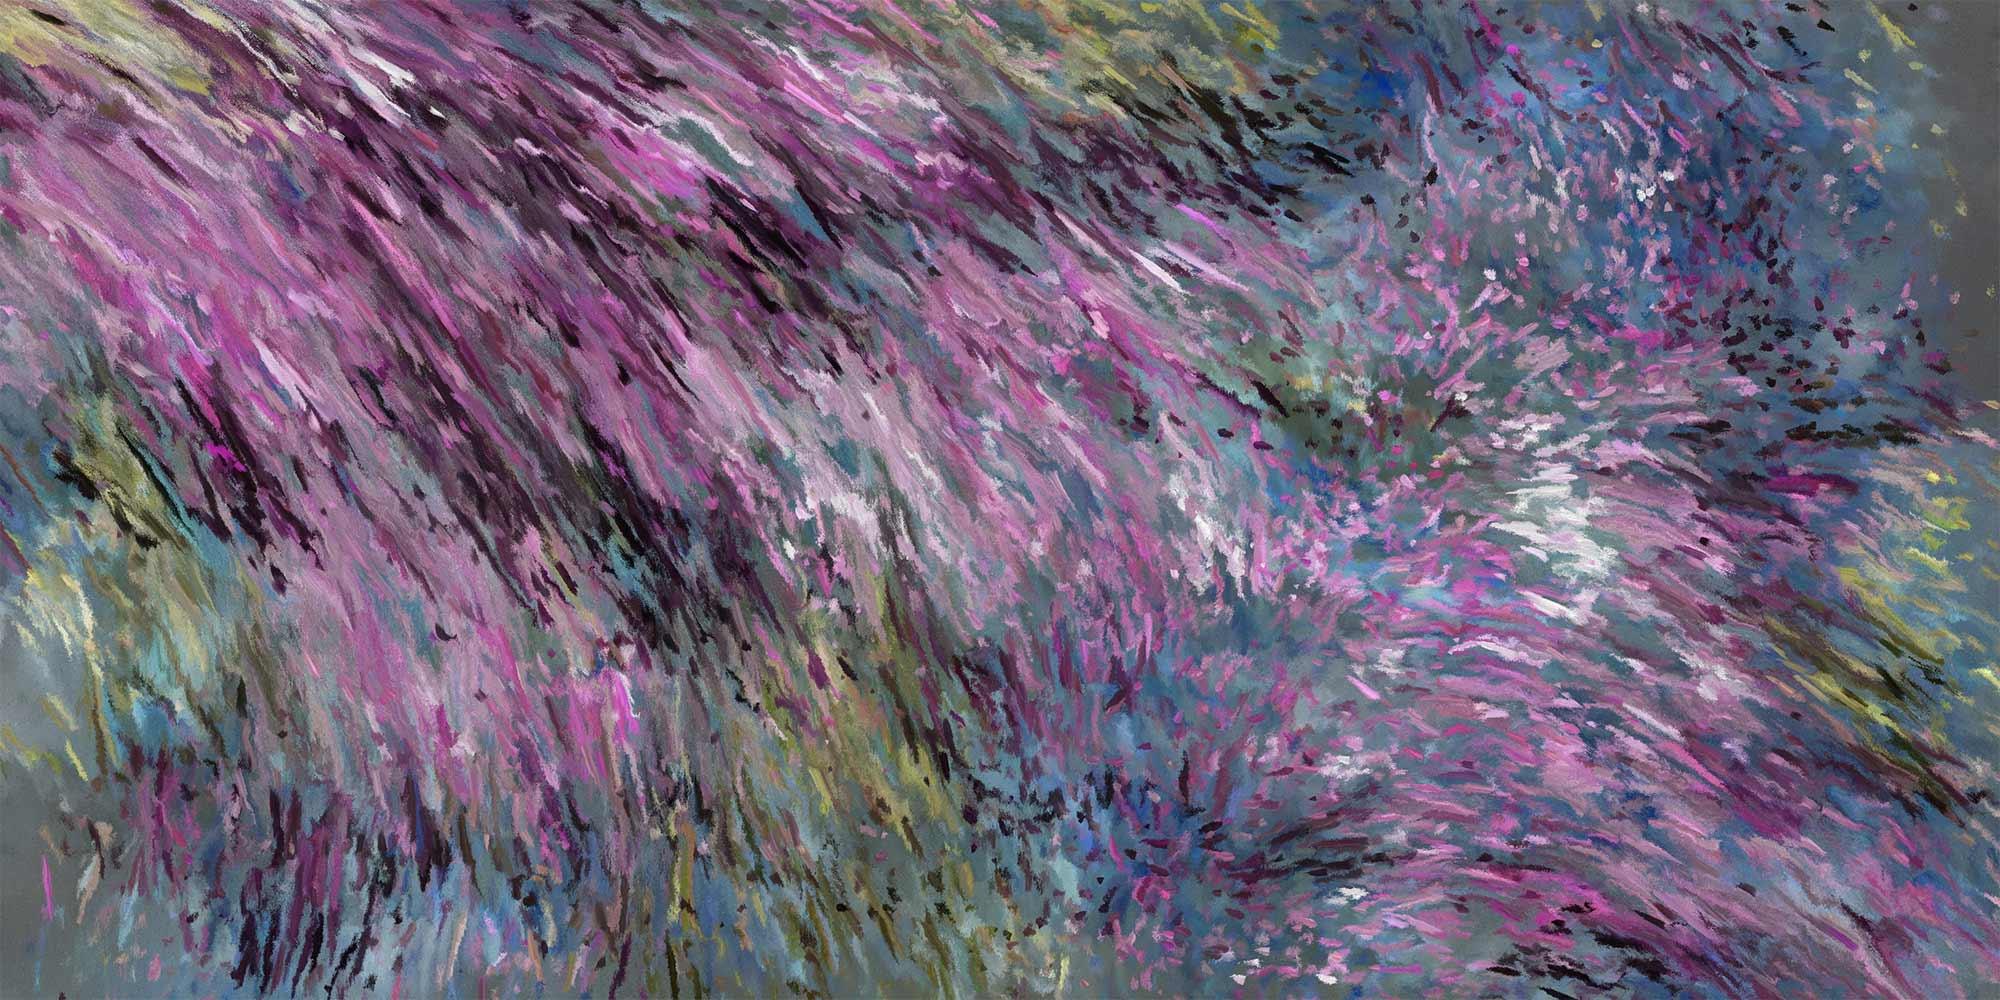 Transient – Impermanent paintings – In Kepler's Gardens